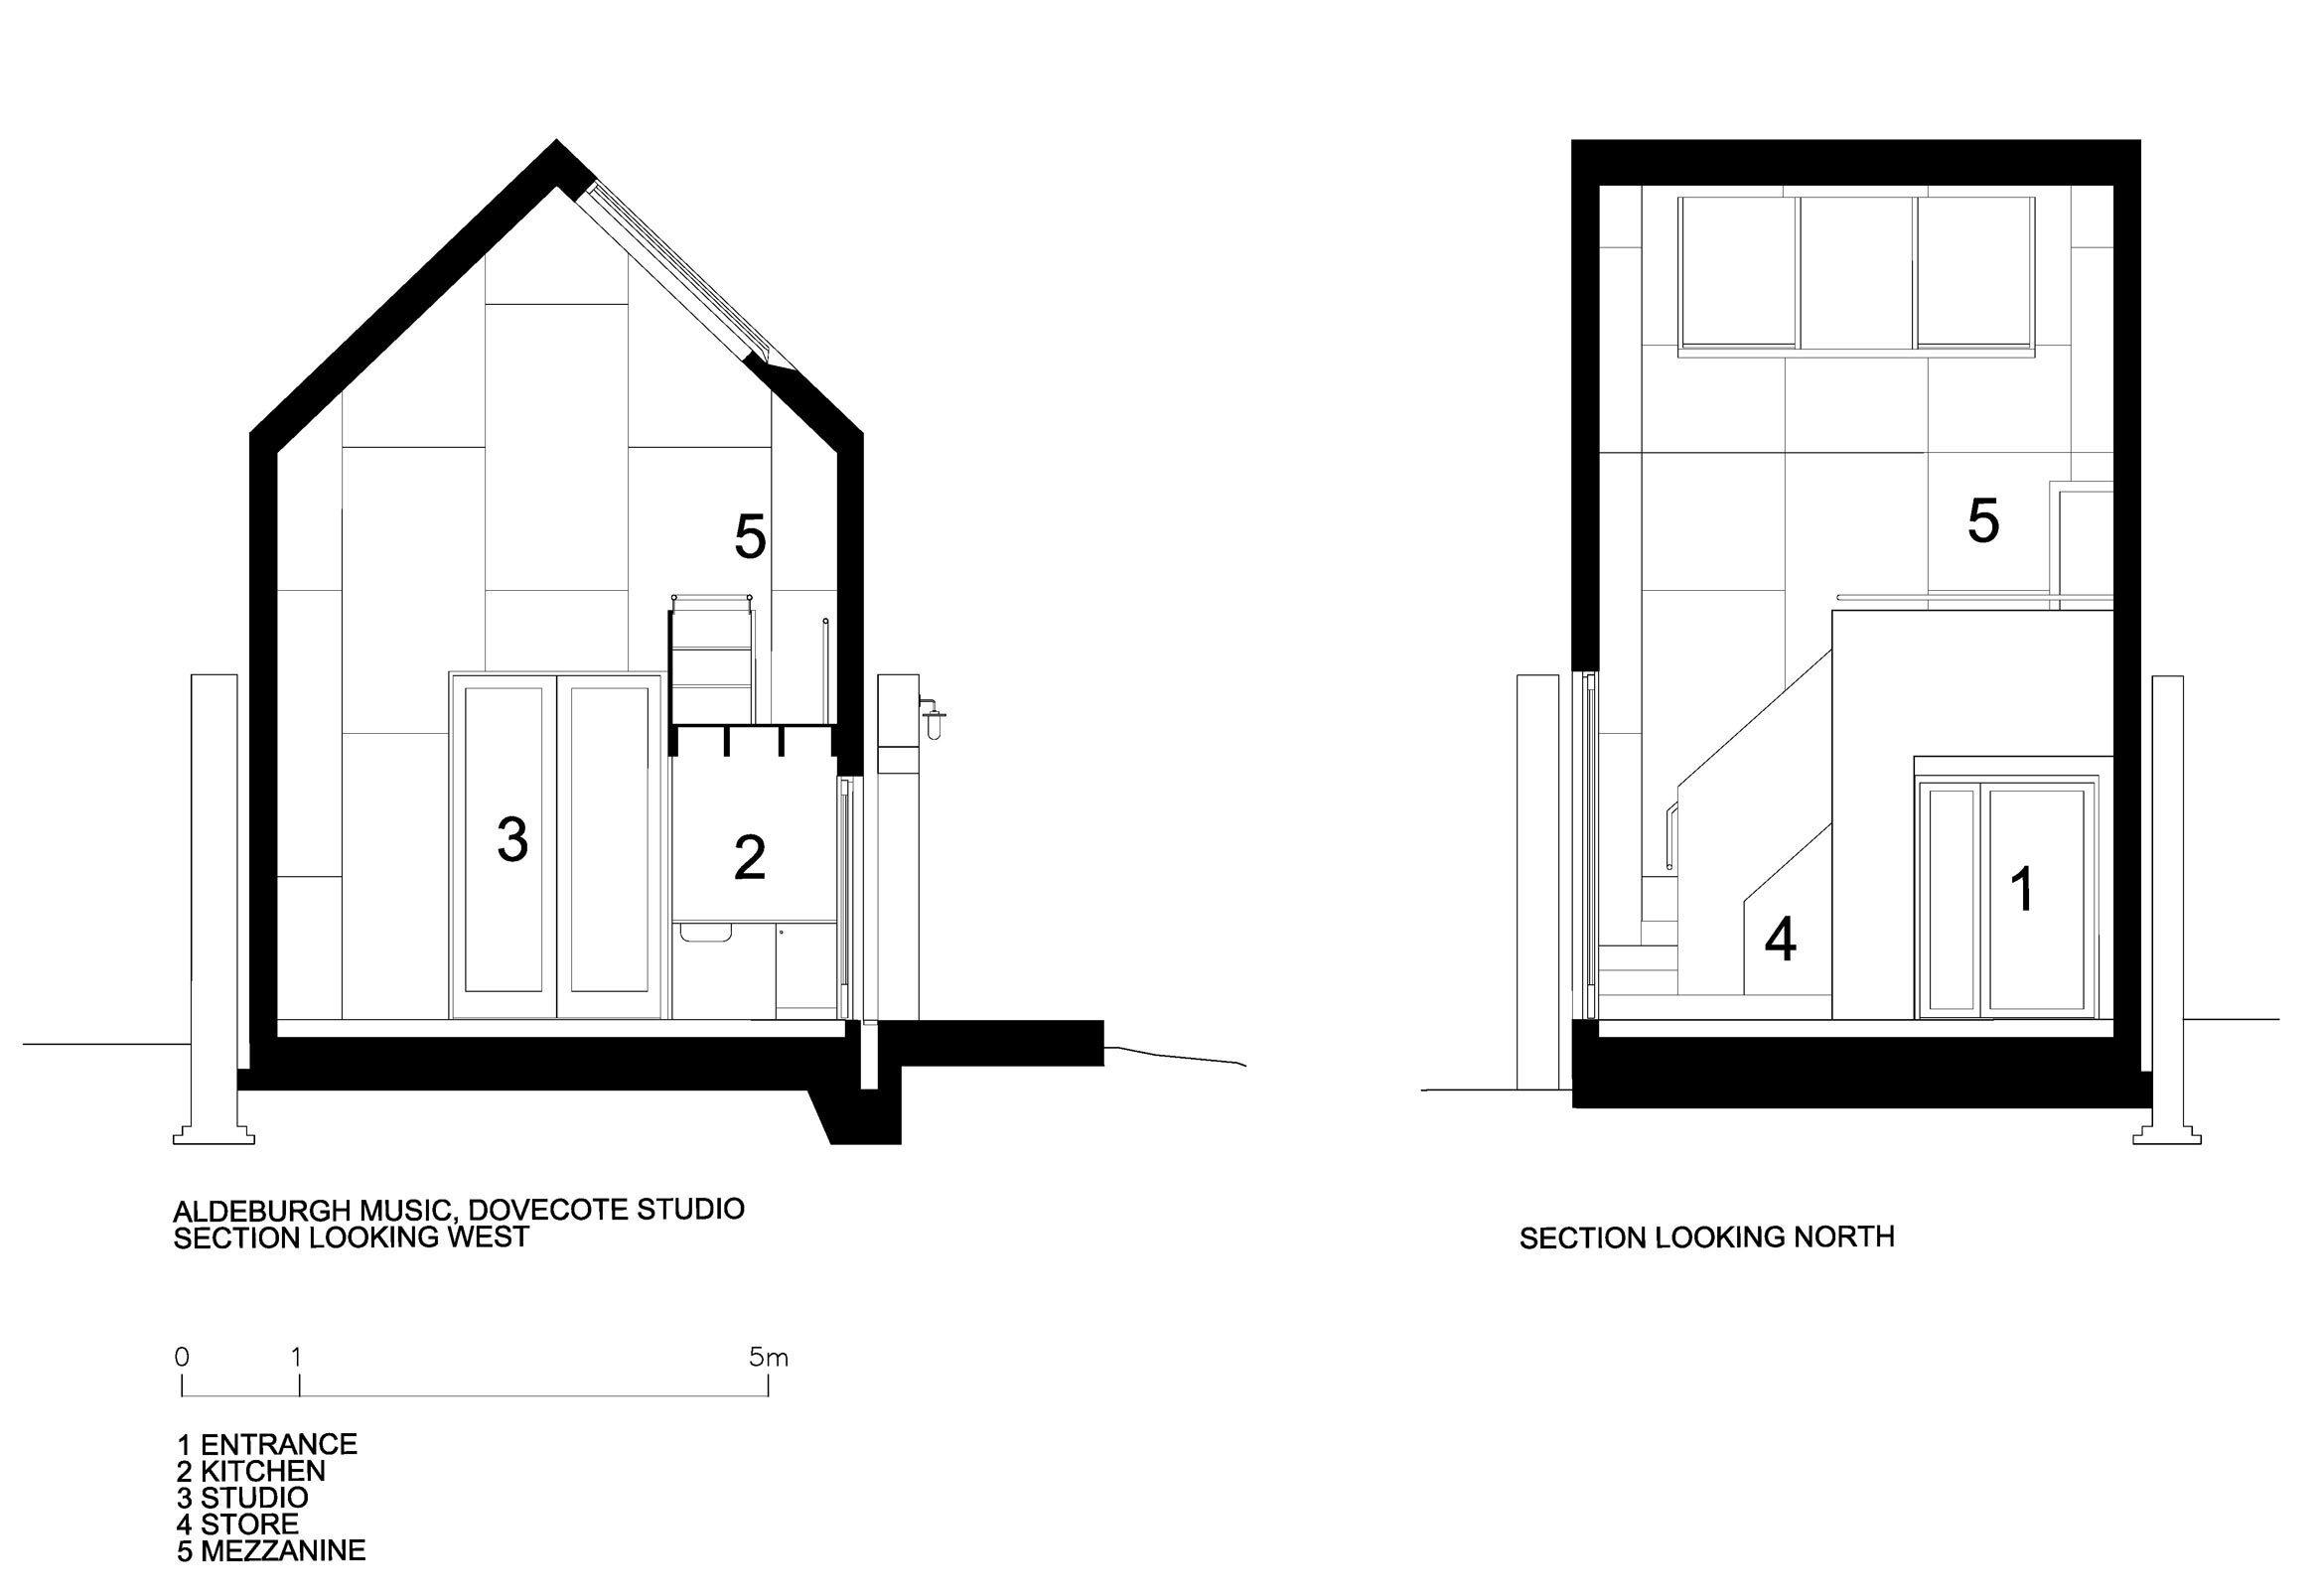 Dovecote Studio - Tiny Retreat - Haworth Tompkins - England - Sections - Humble Homes